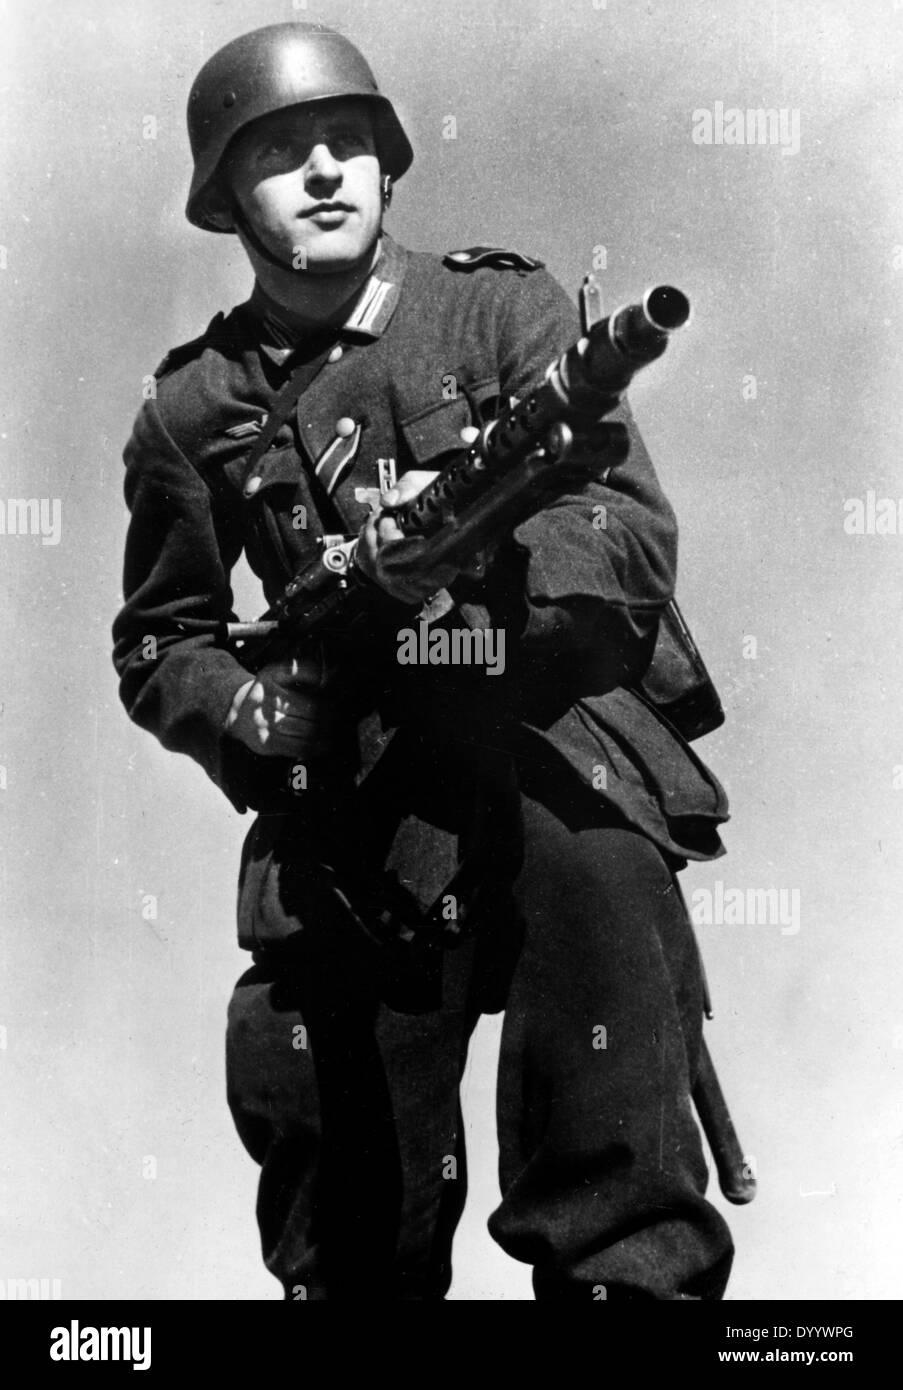 German soldier, 1943 Stock Photo - Alamy